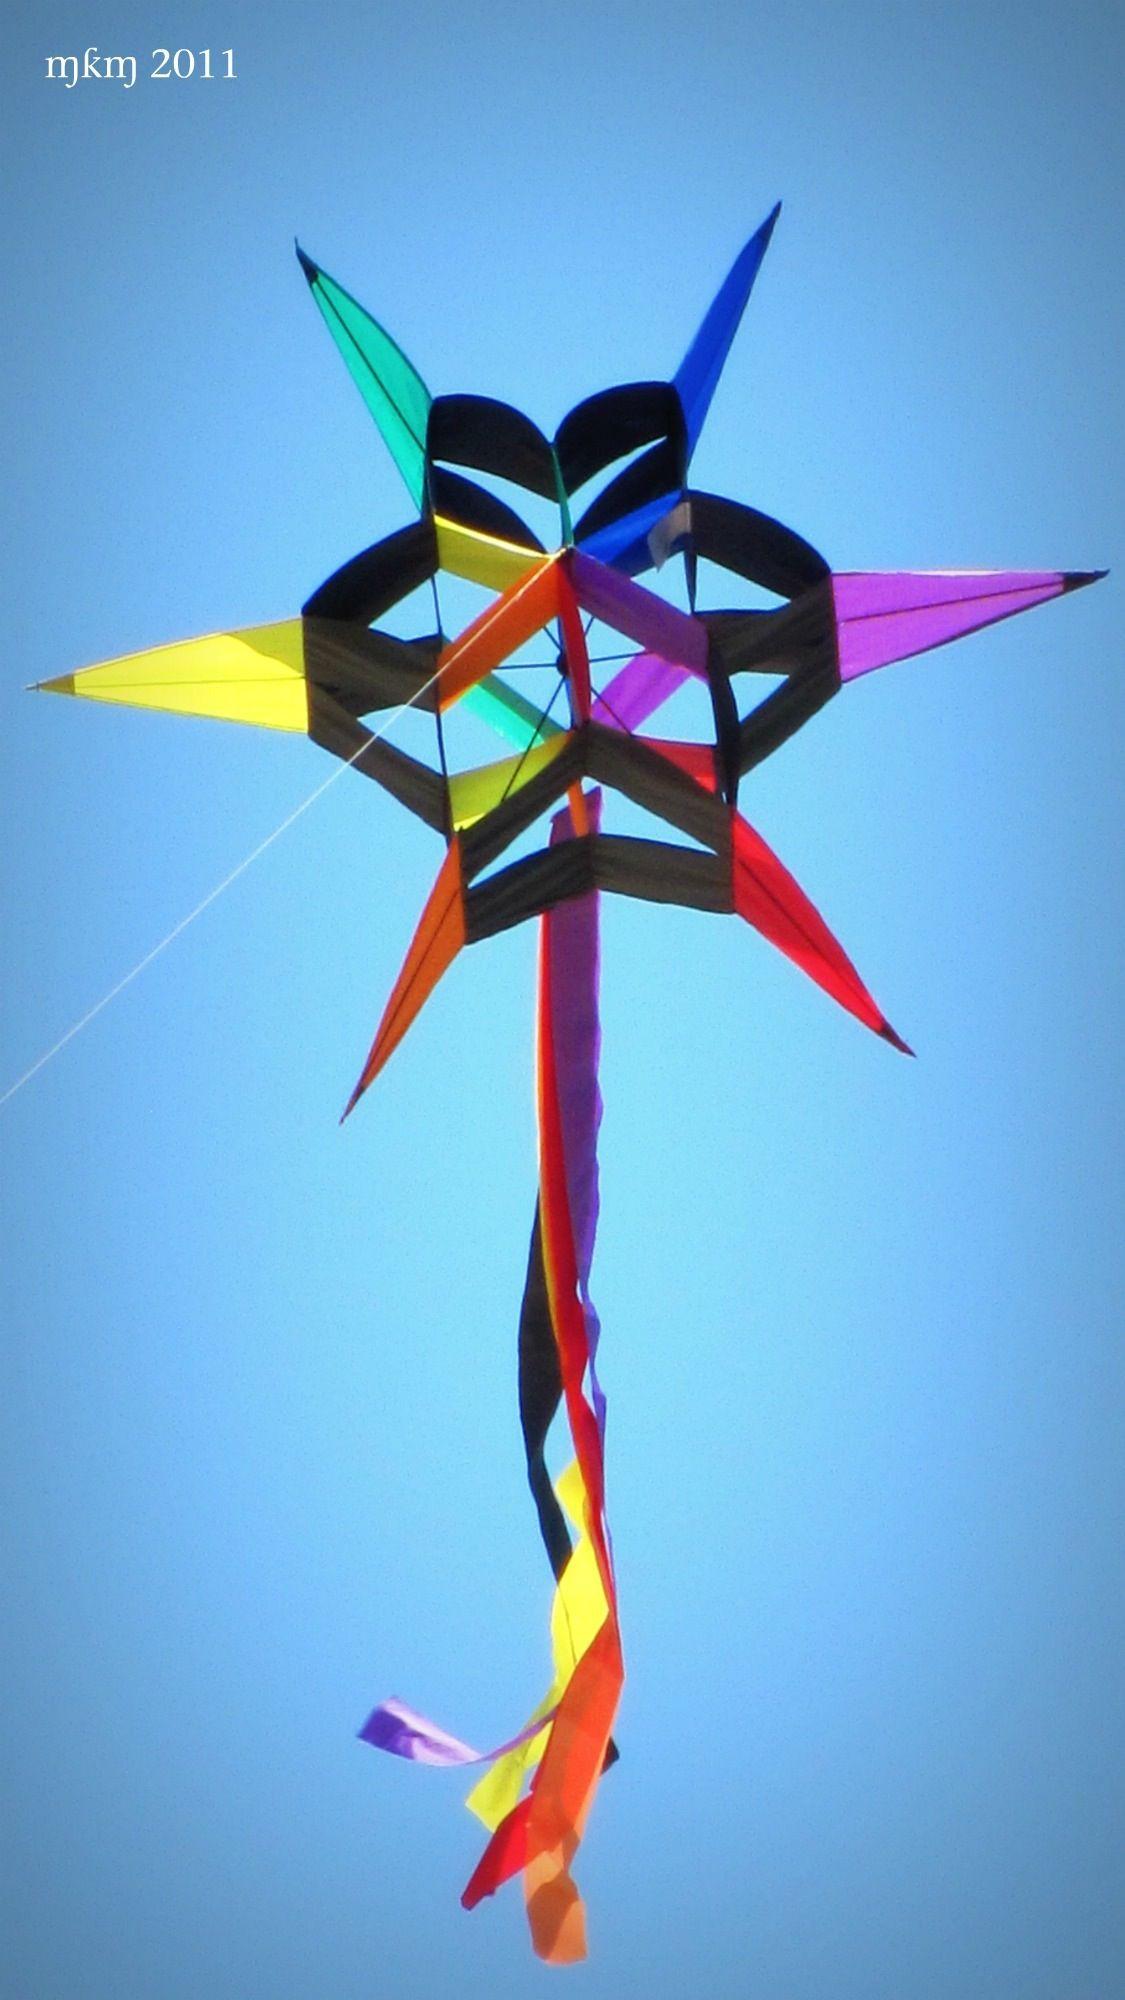 Rainbow Kite Shutrbugz Studios Photography